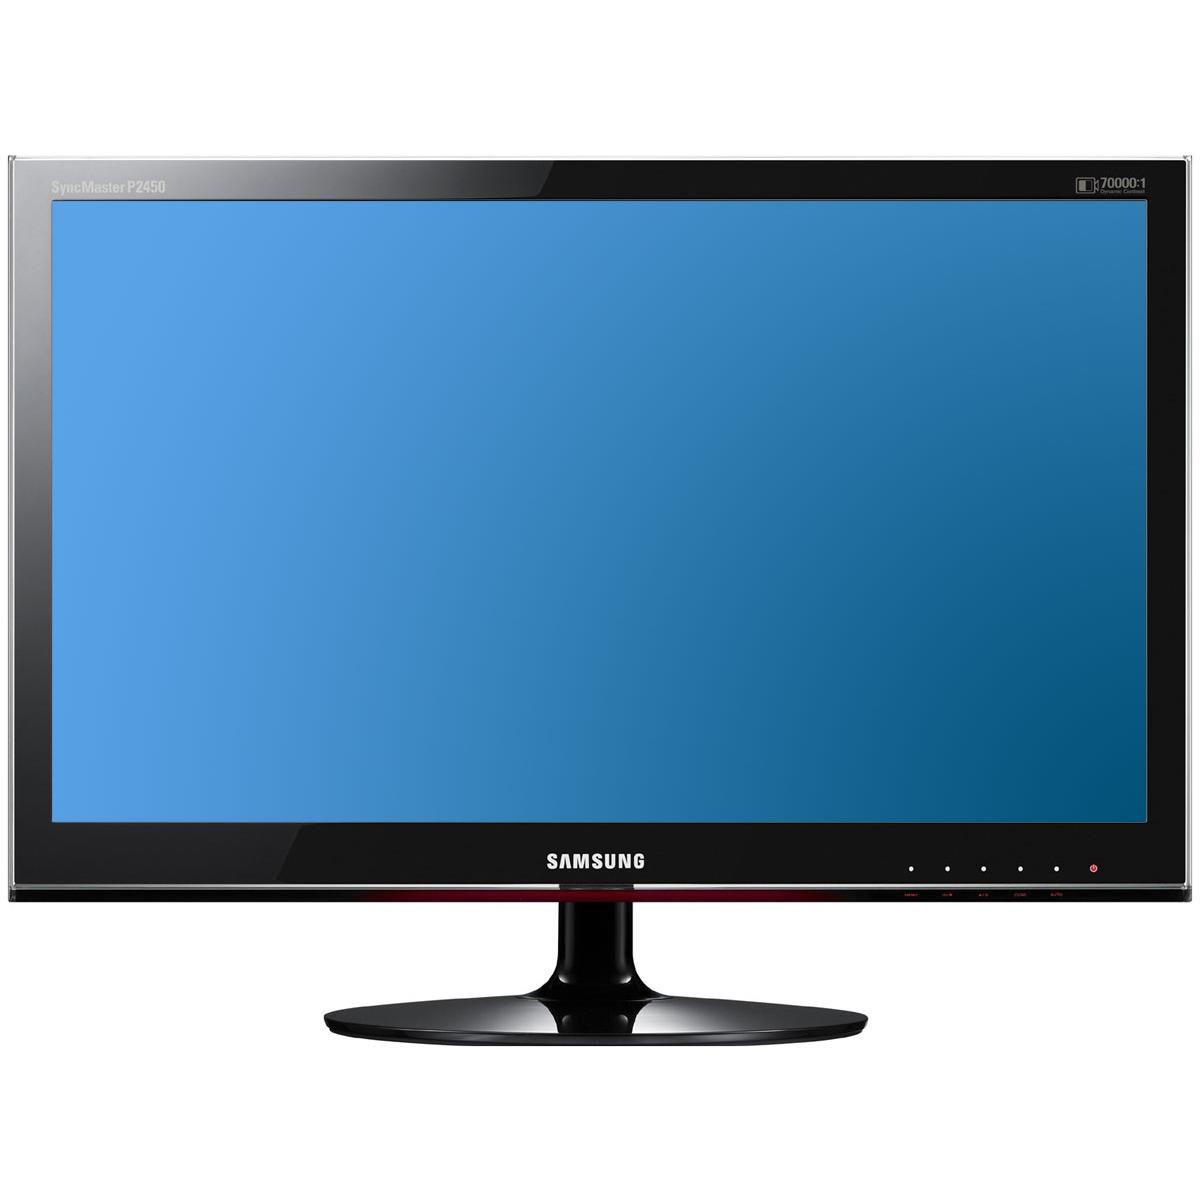 "Ecran PC Samsung P2450H Samsung 24"" LCD - SyncMaster P2450H - 2 ms - Format large 16/9"